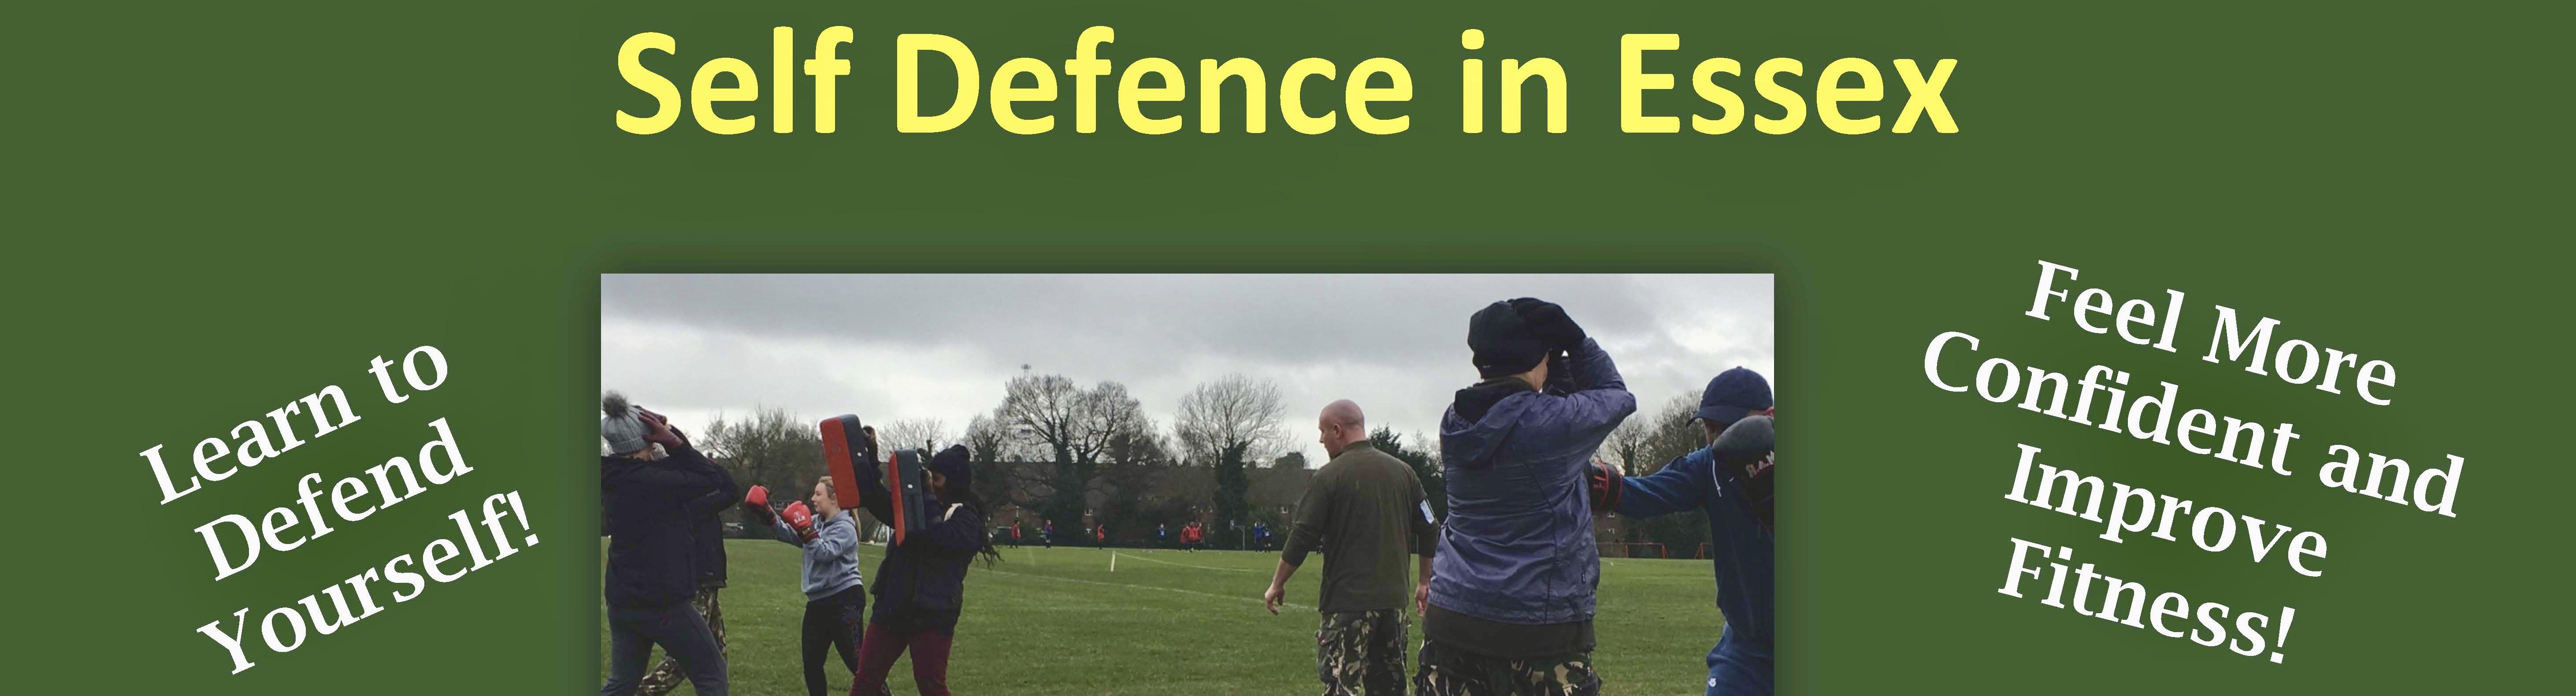 Testimonial Self Defence with SDF Essex